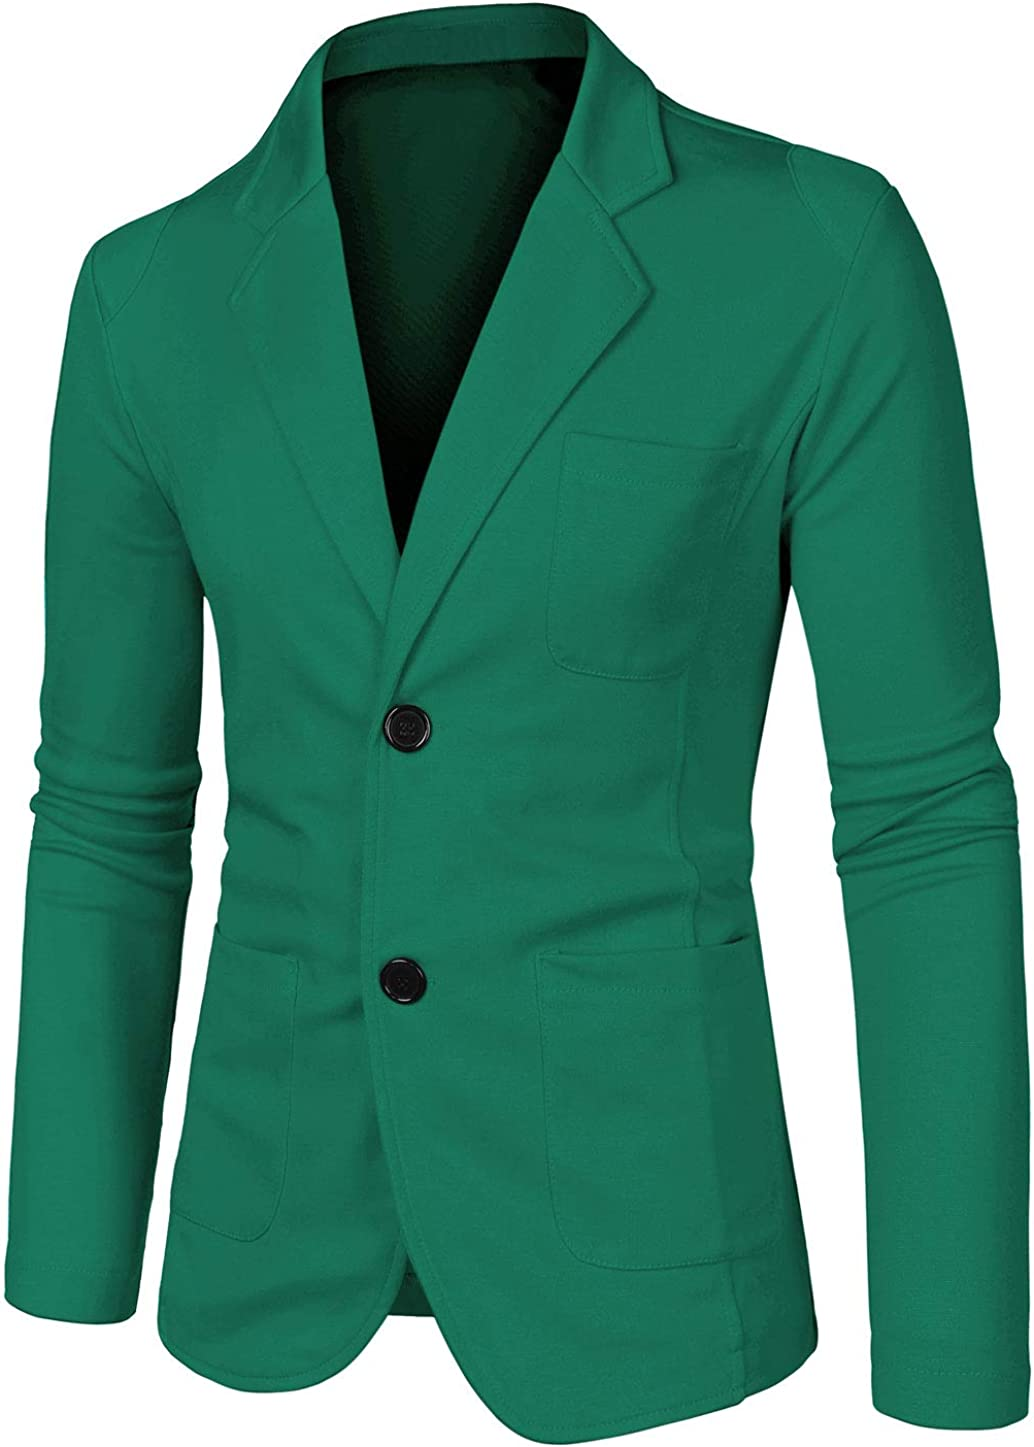 Cheap SALE Start uxcell Men's Jacksonville Mall Casual Sports Coat Slim Fit Card Button Lightweight